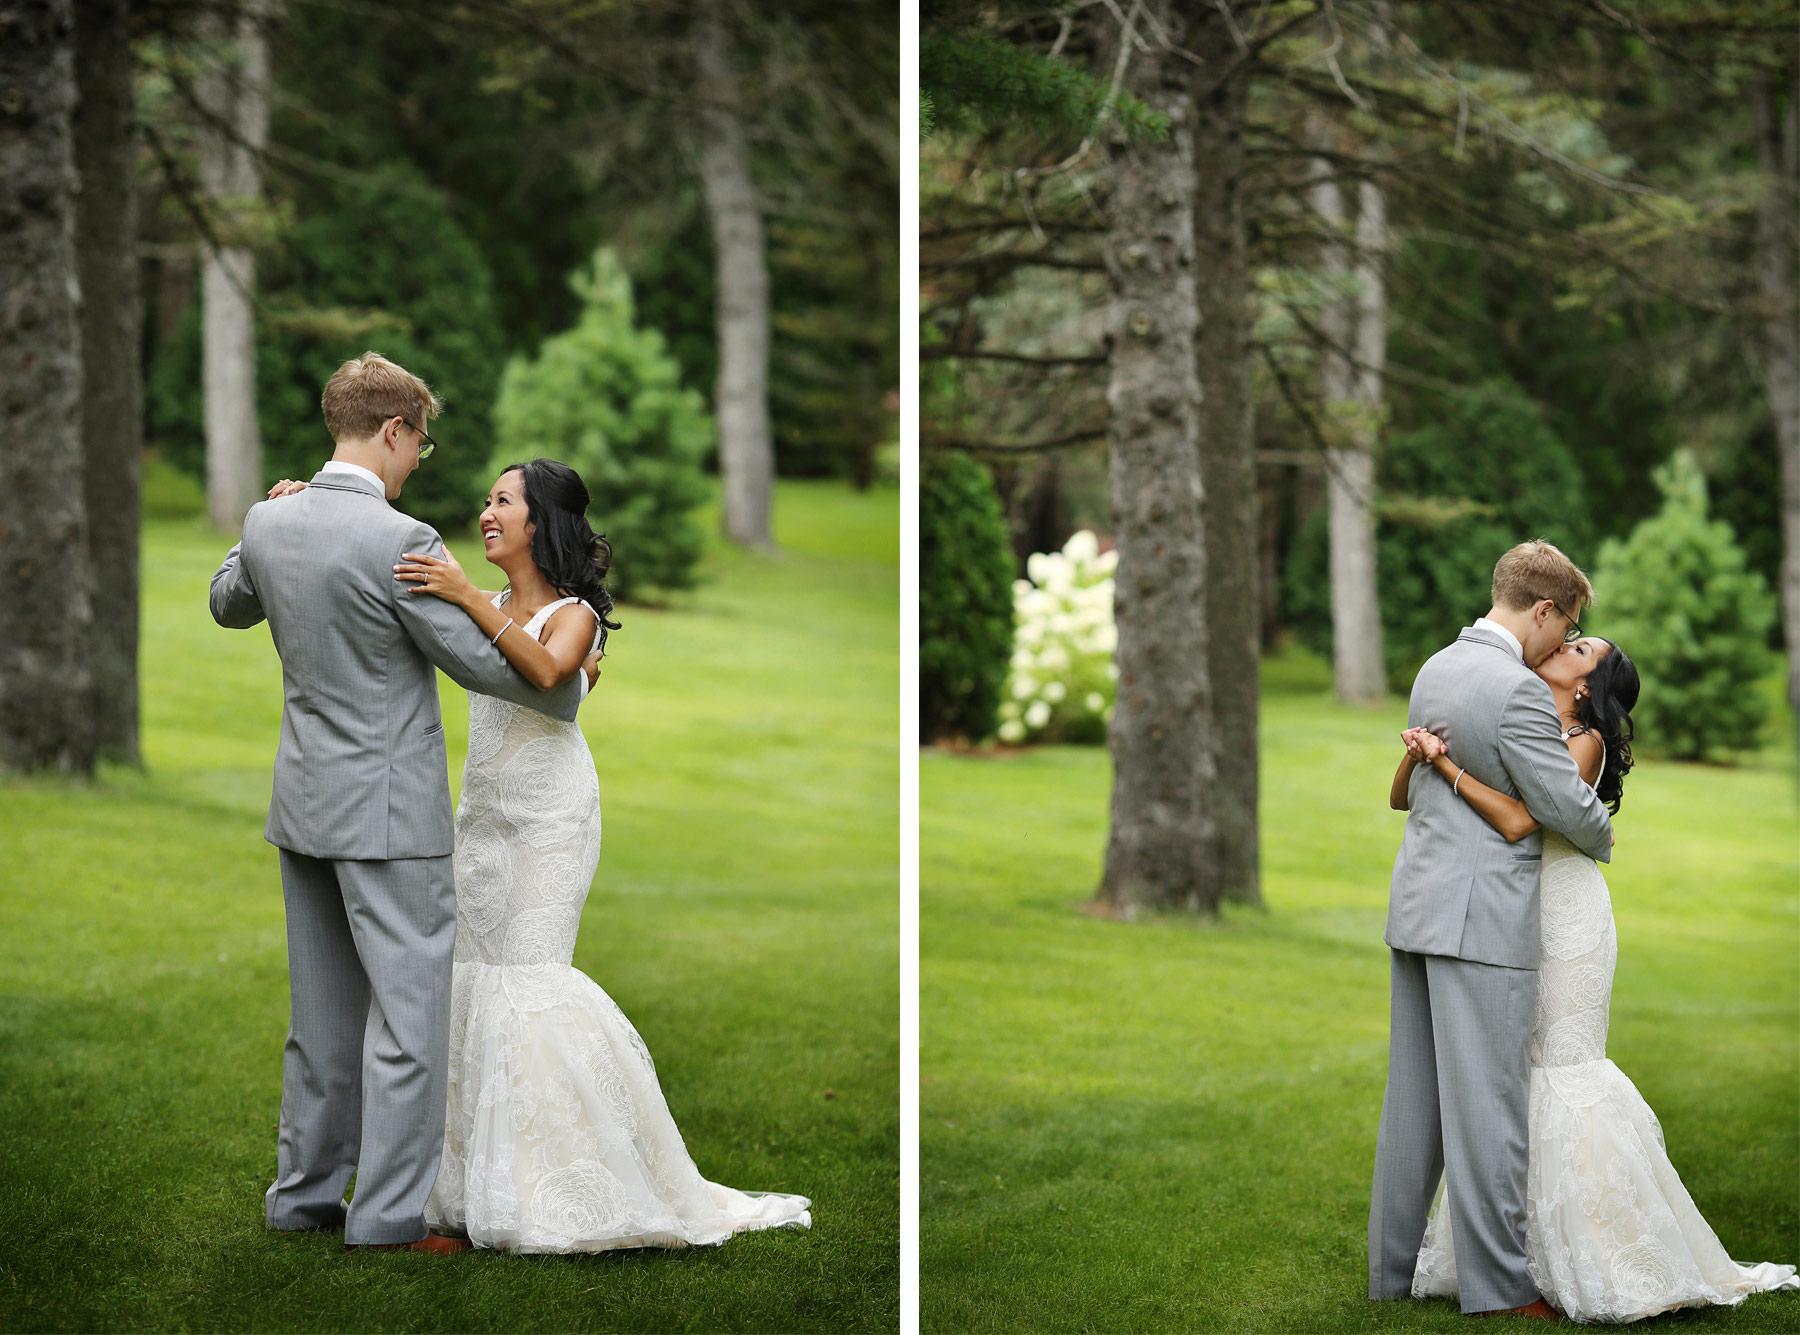 04-Minneapolis-Minnesota-Wedding-Photography-by-Vick-Photography-Garden-First-Look-Daphne-&-Austin.jpg